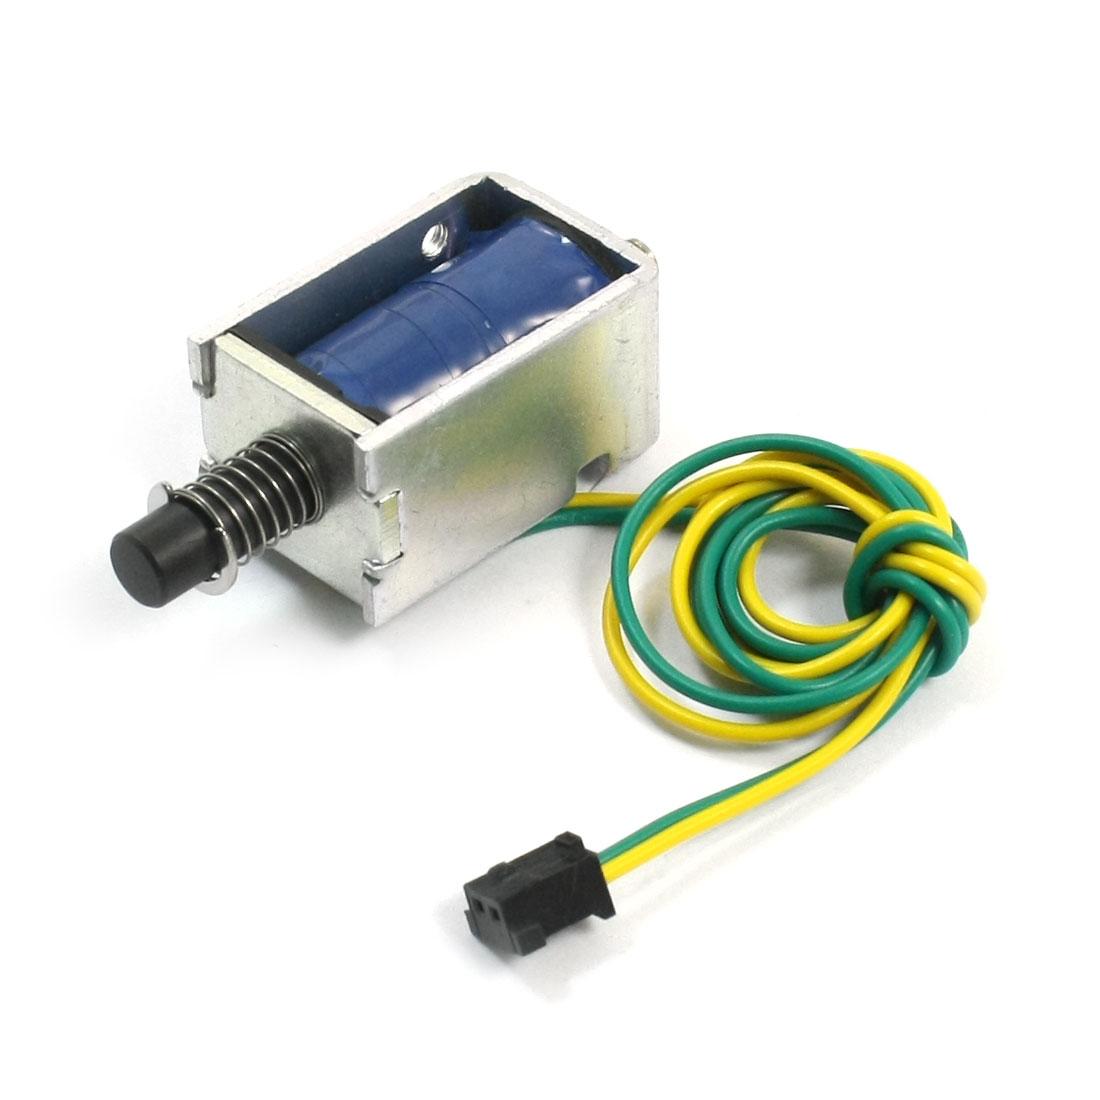 24V 1.33A 2mm 450g 5mm 250g Push Pull Type Action Open Frame Spring Plunger DC Solenoid Electromagnet